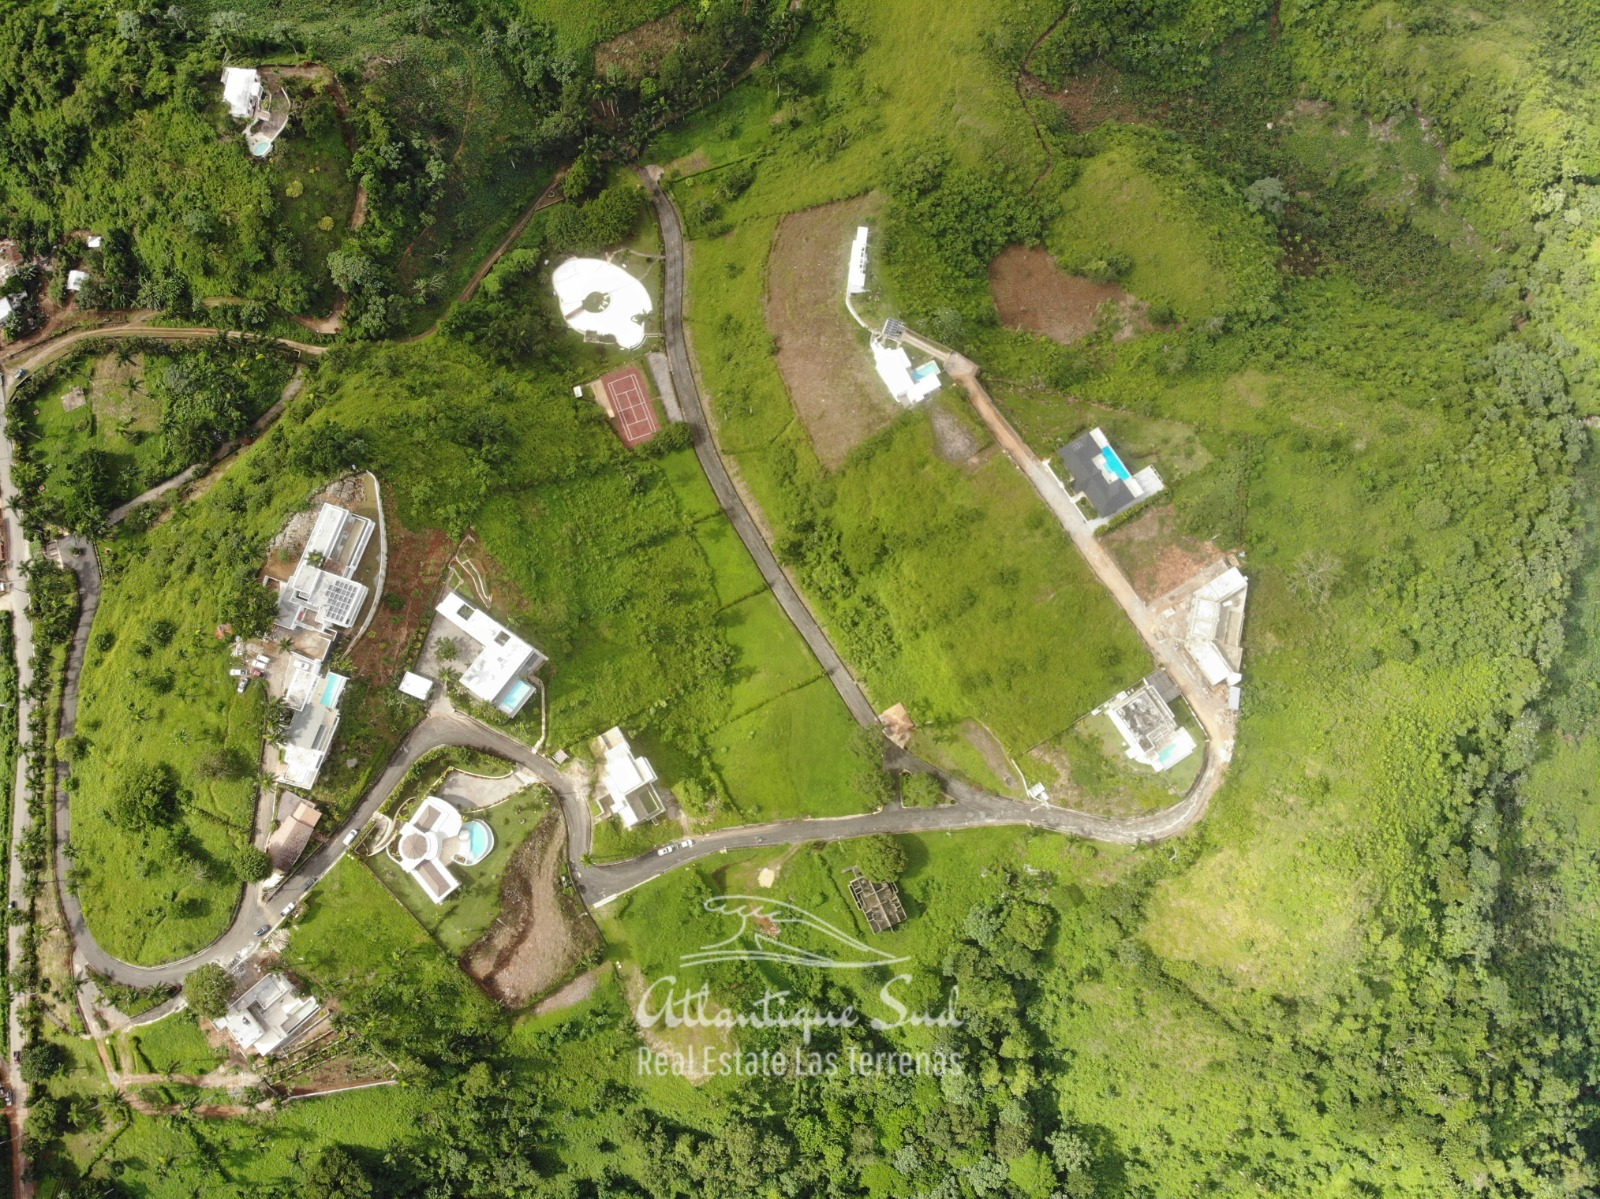 Hillside Lots for sale in Las Terrenas4.jpeg